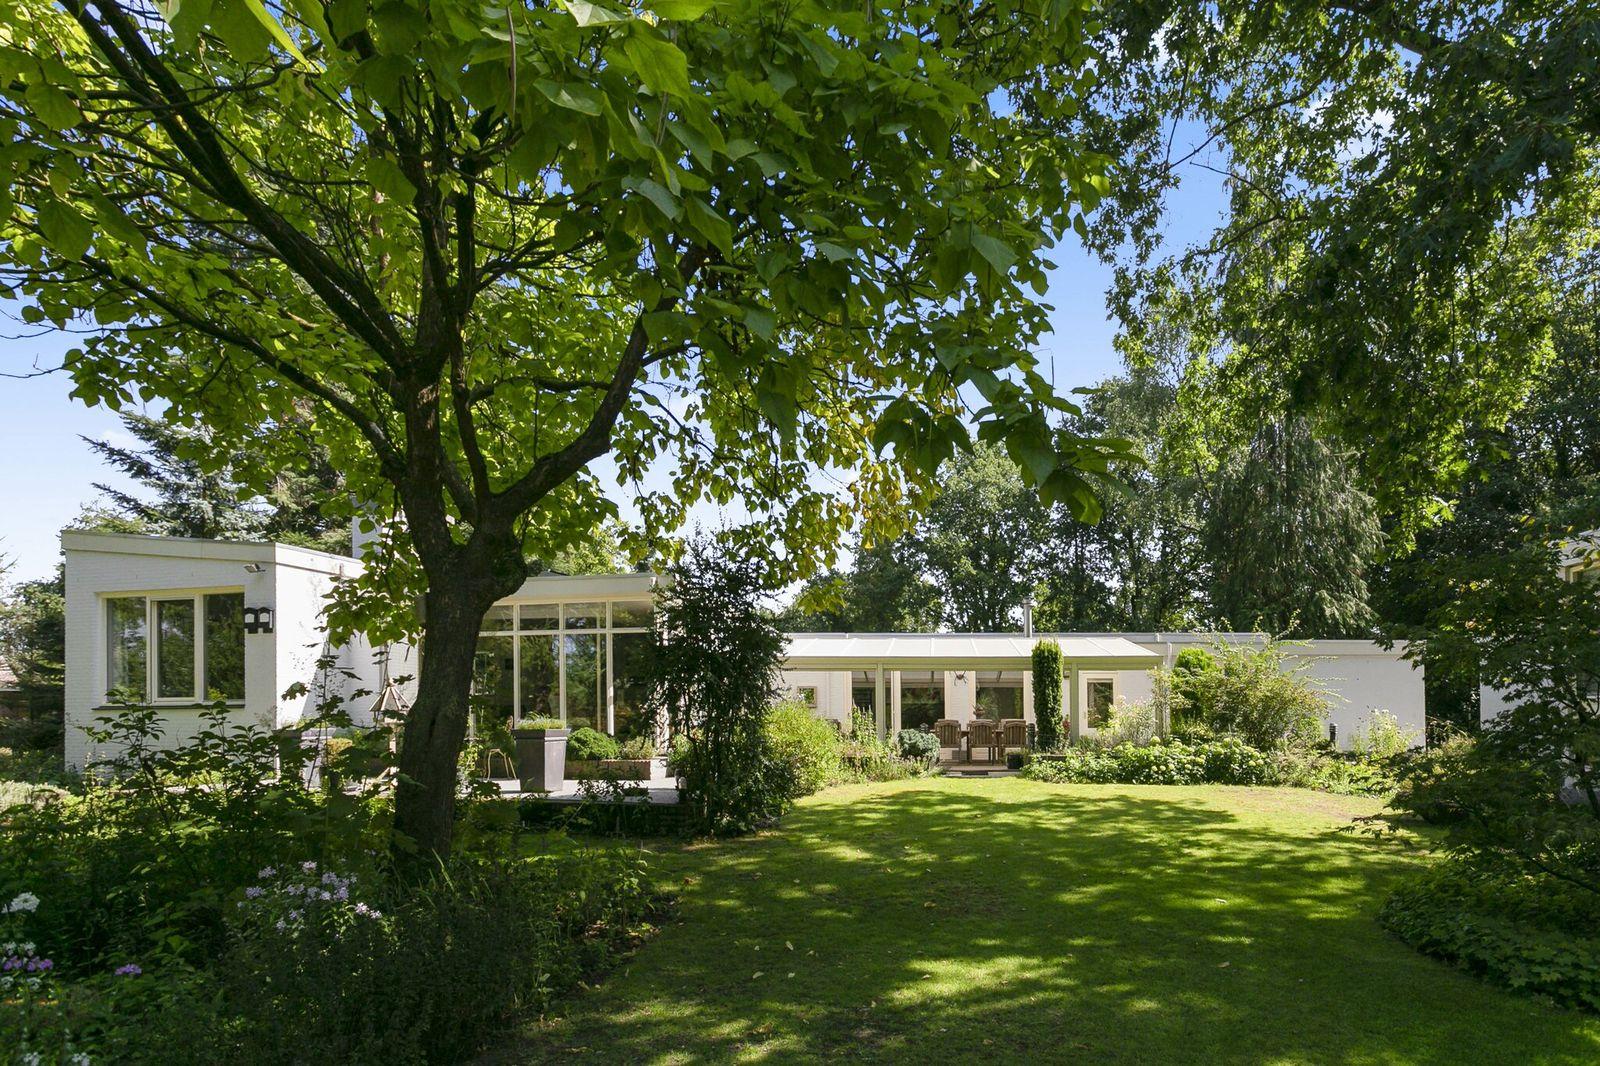 Bosrand 6, Lieshout